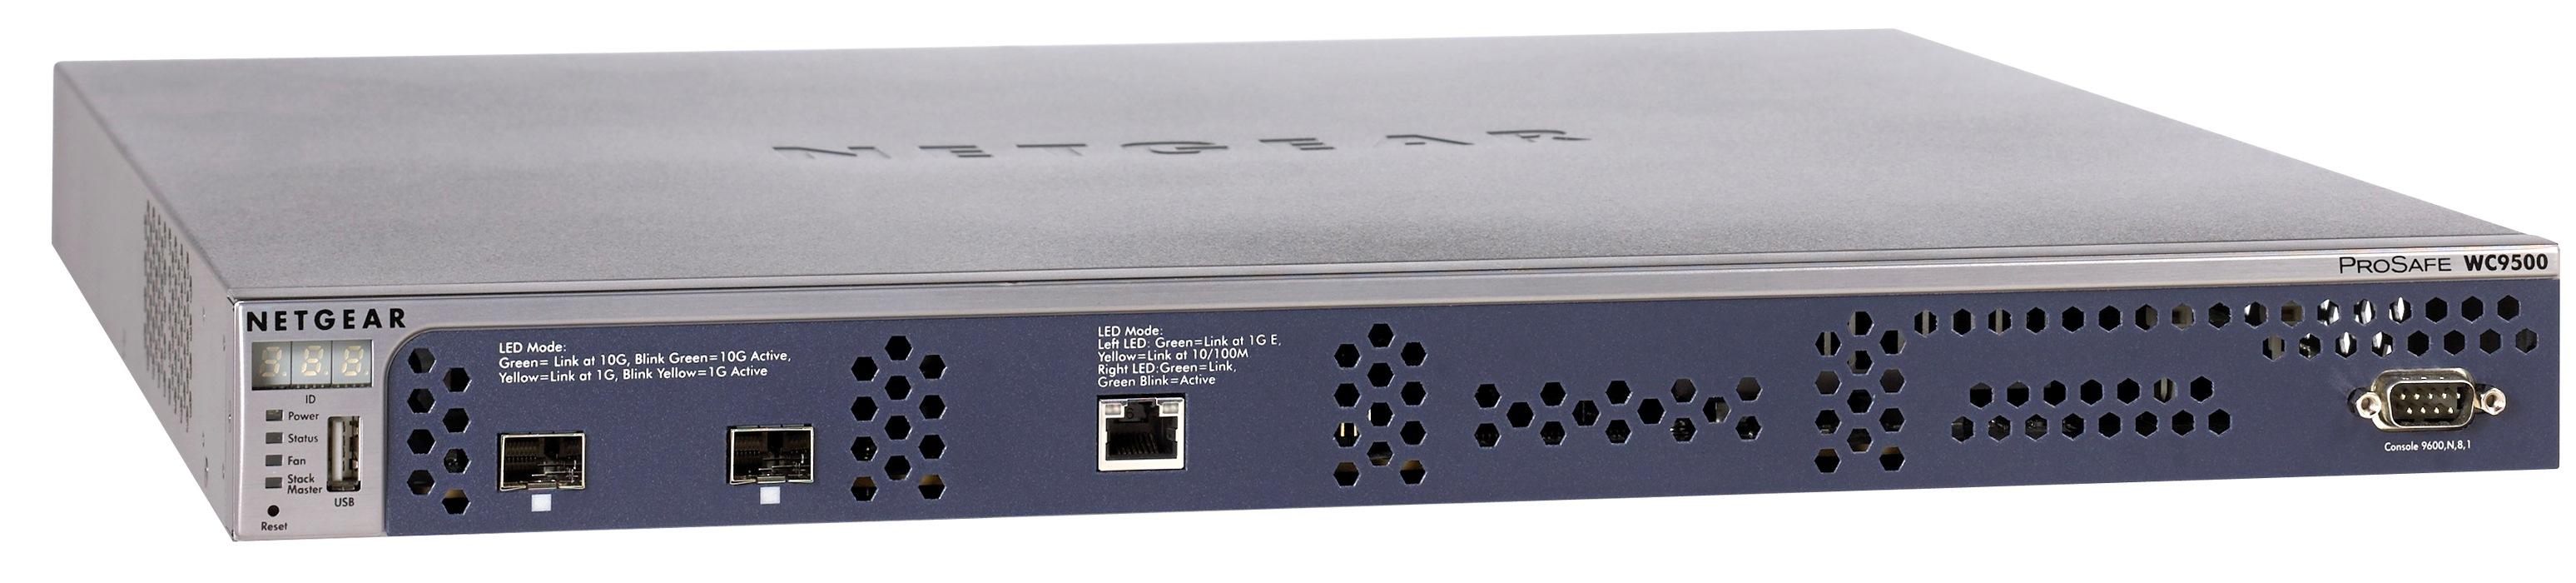 NETGEAR 500 AP WLS CONTROLLER;WC9500